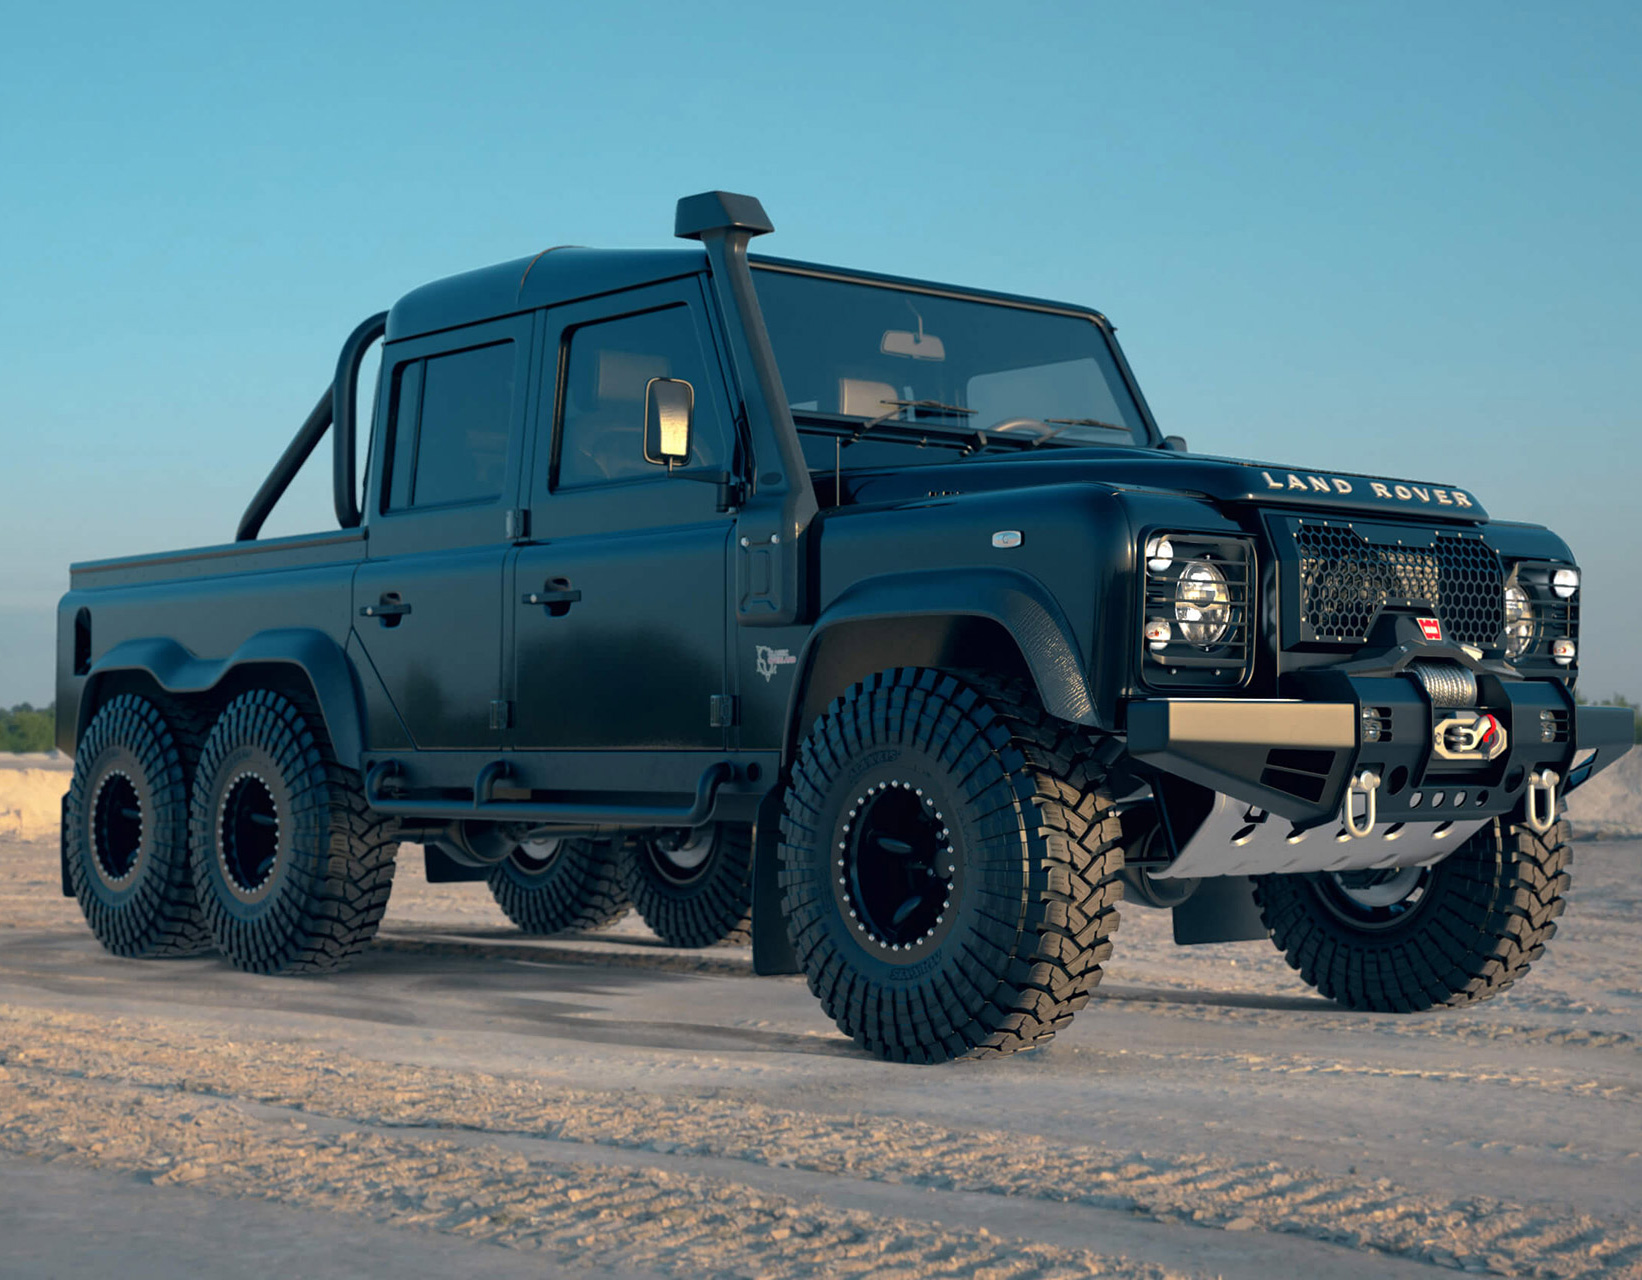 Land Rover Black Mamba 6x6 Defender